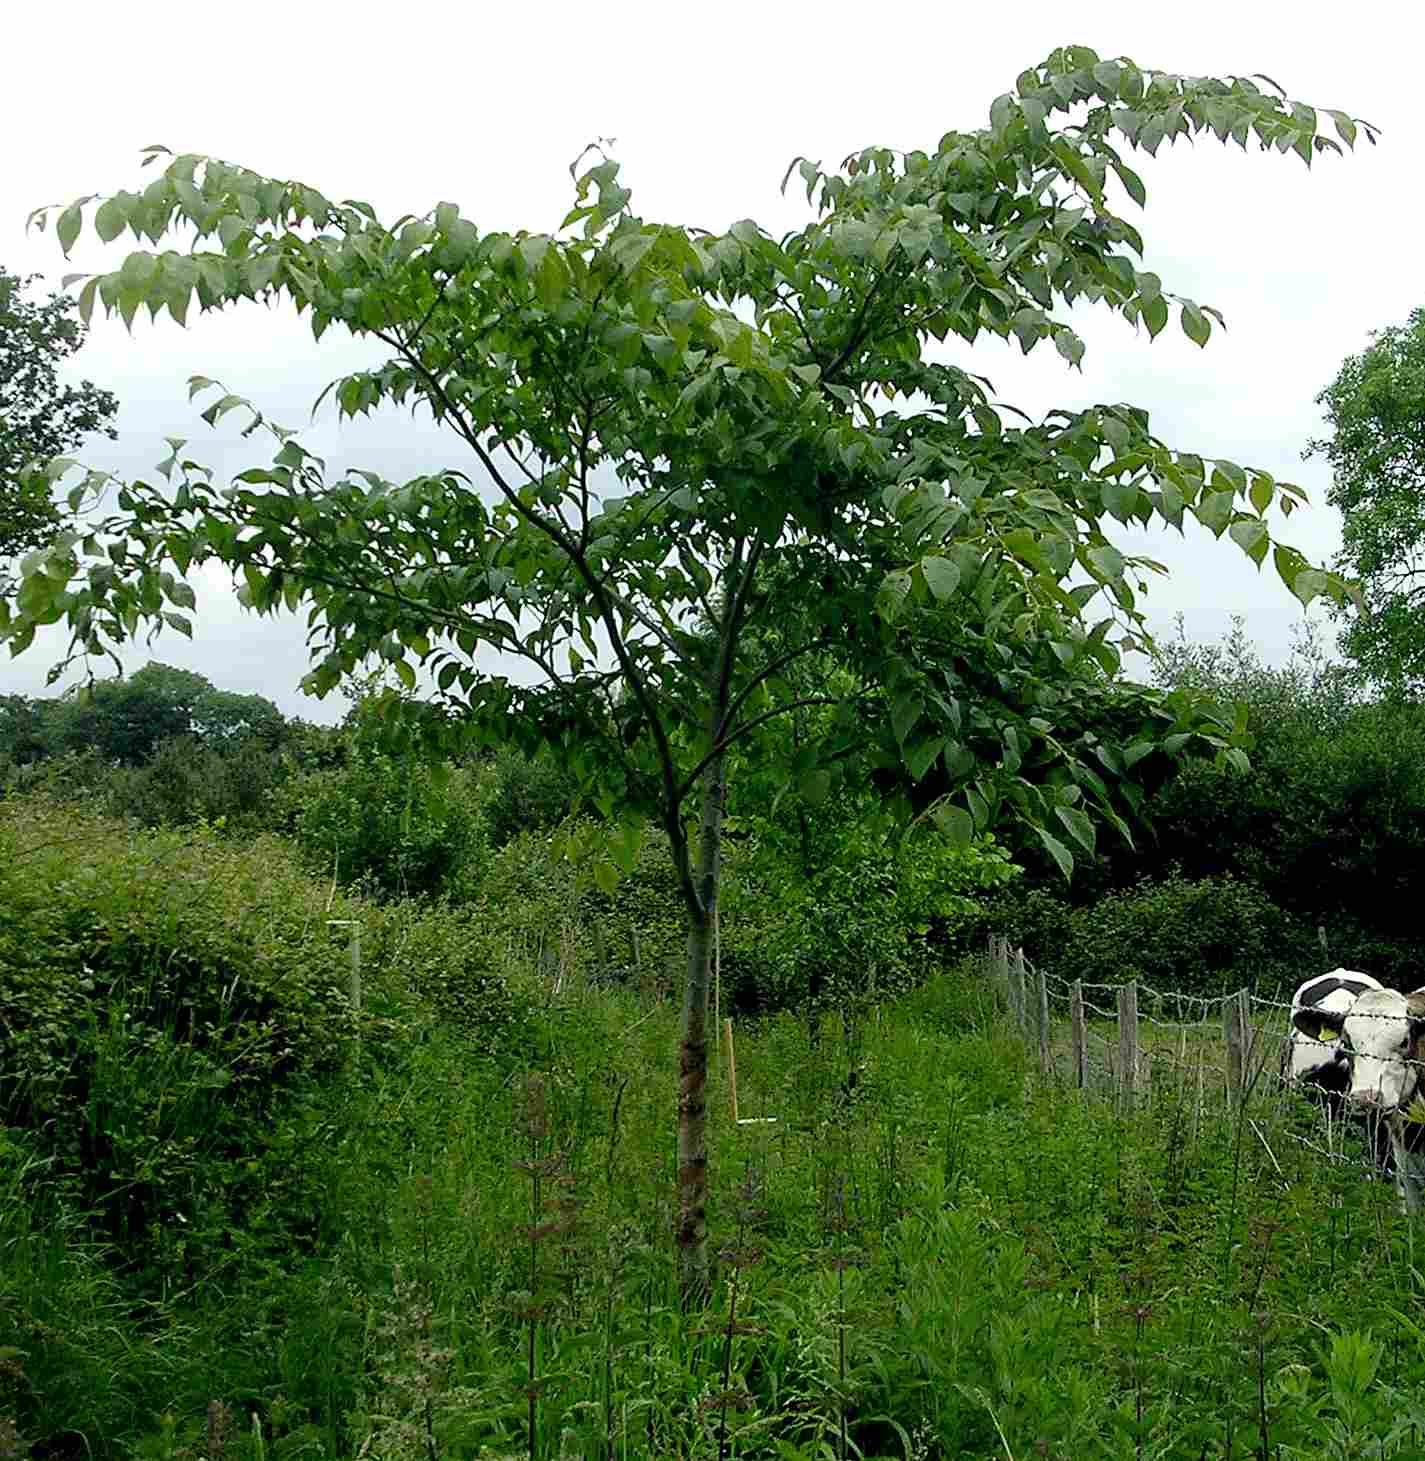 David elm with green foliage